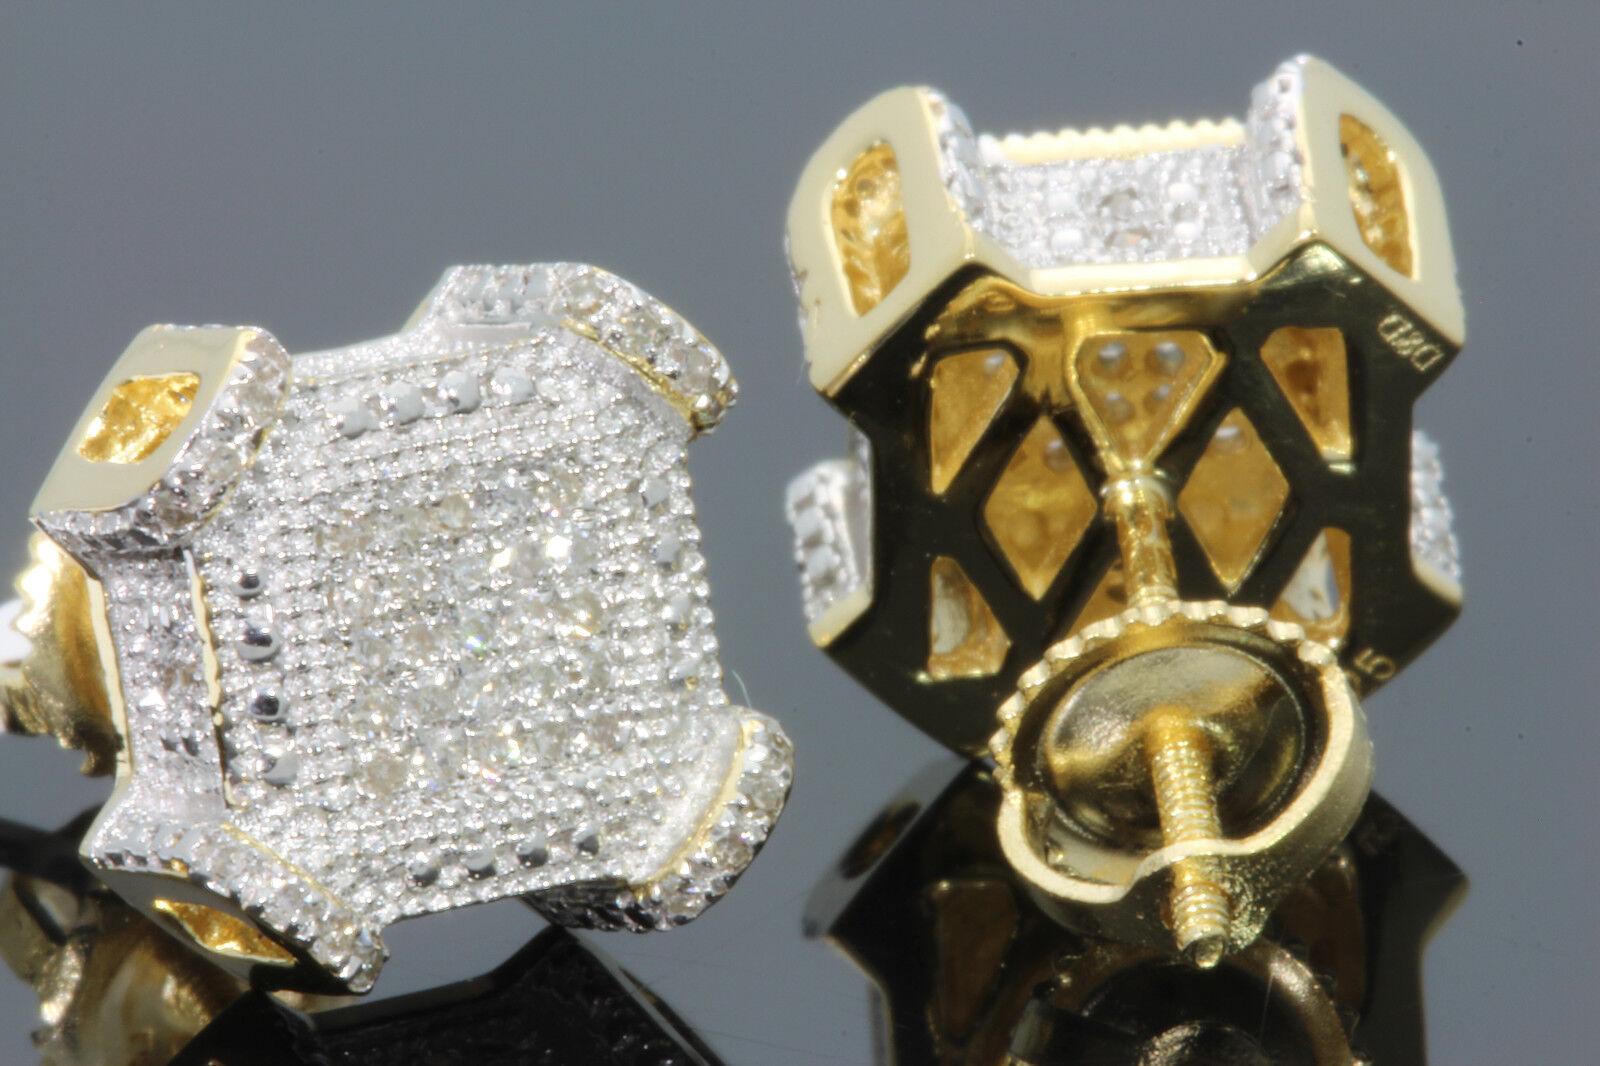 .29 CT STERLING SILVER GOLD FINISH MEN WOMEN 10 mm REAL DIAMONDS EARRINGS STUDS 2